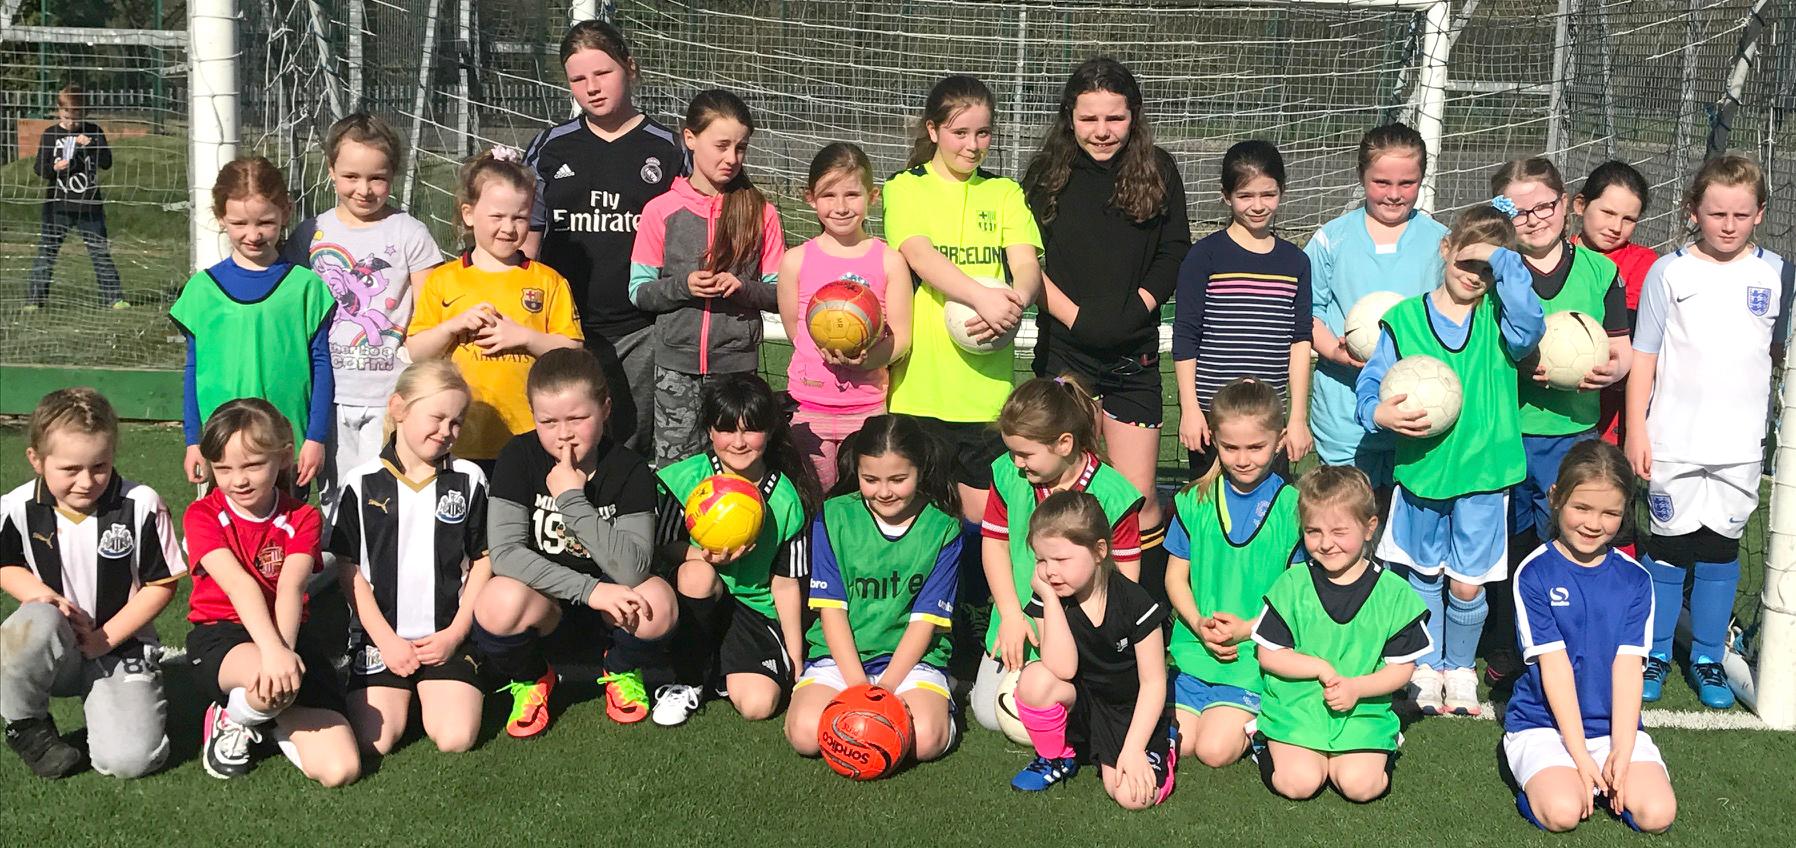 Lift Off for Girls Football